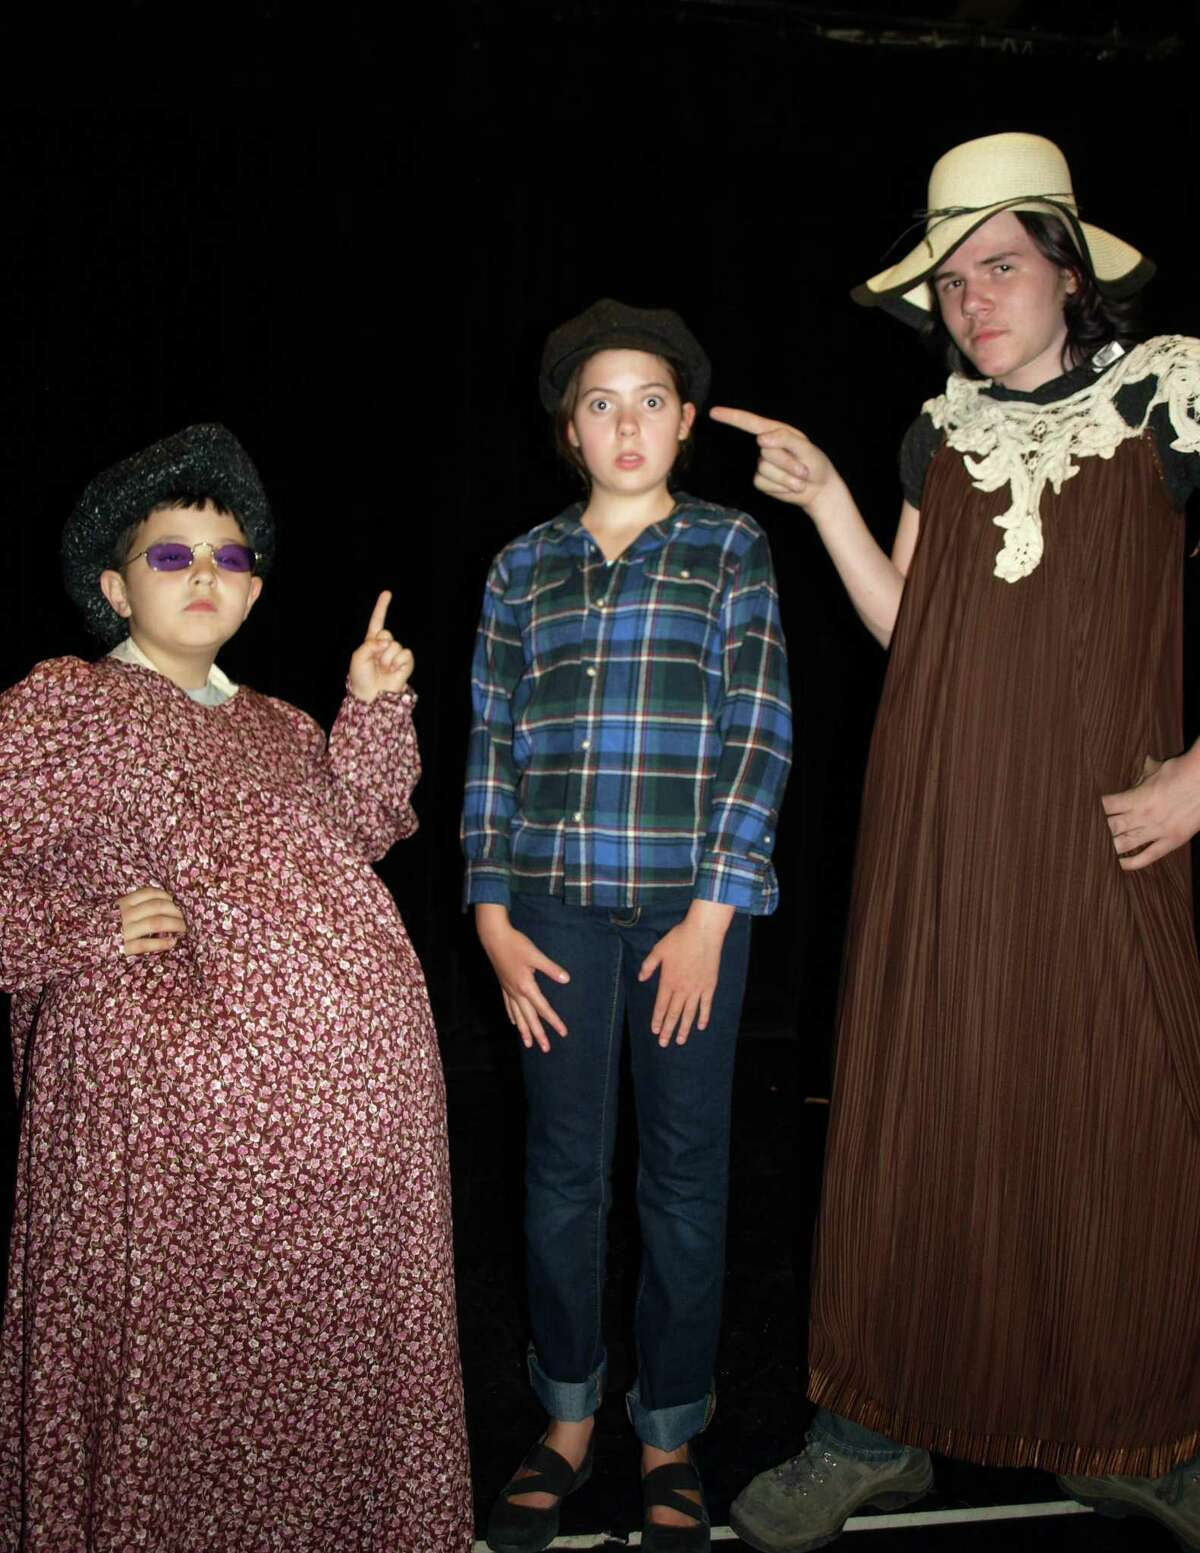 James, center, played by Lilly Tobin, is admonished for failing to week the entire garden by Aunt Sponge (left) Elisha Boguslavskiy, and Aunt Spiker Sam Bemis.